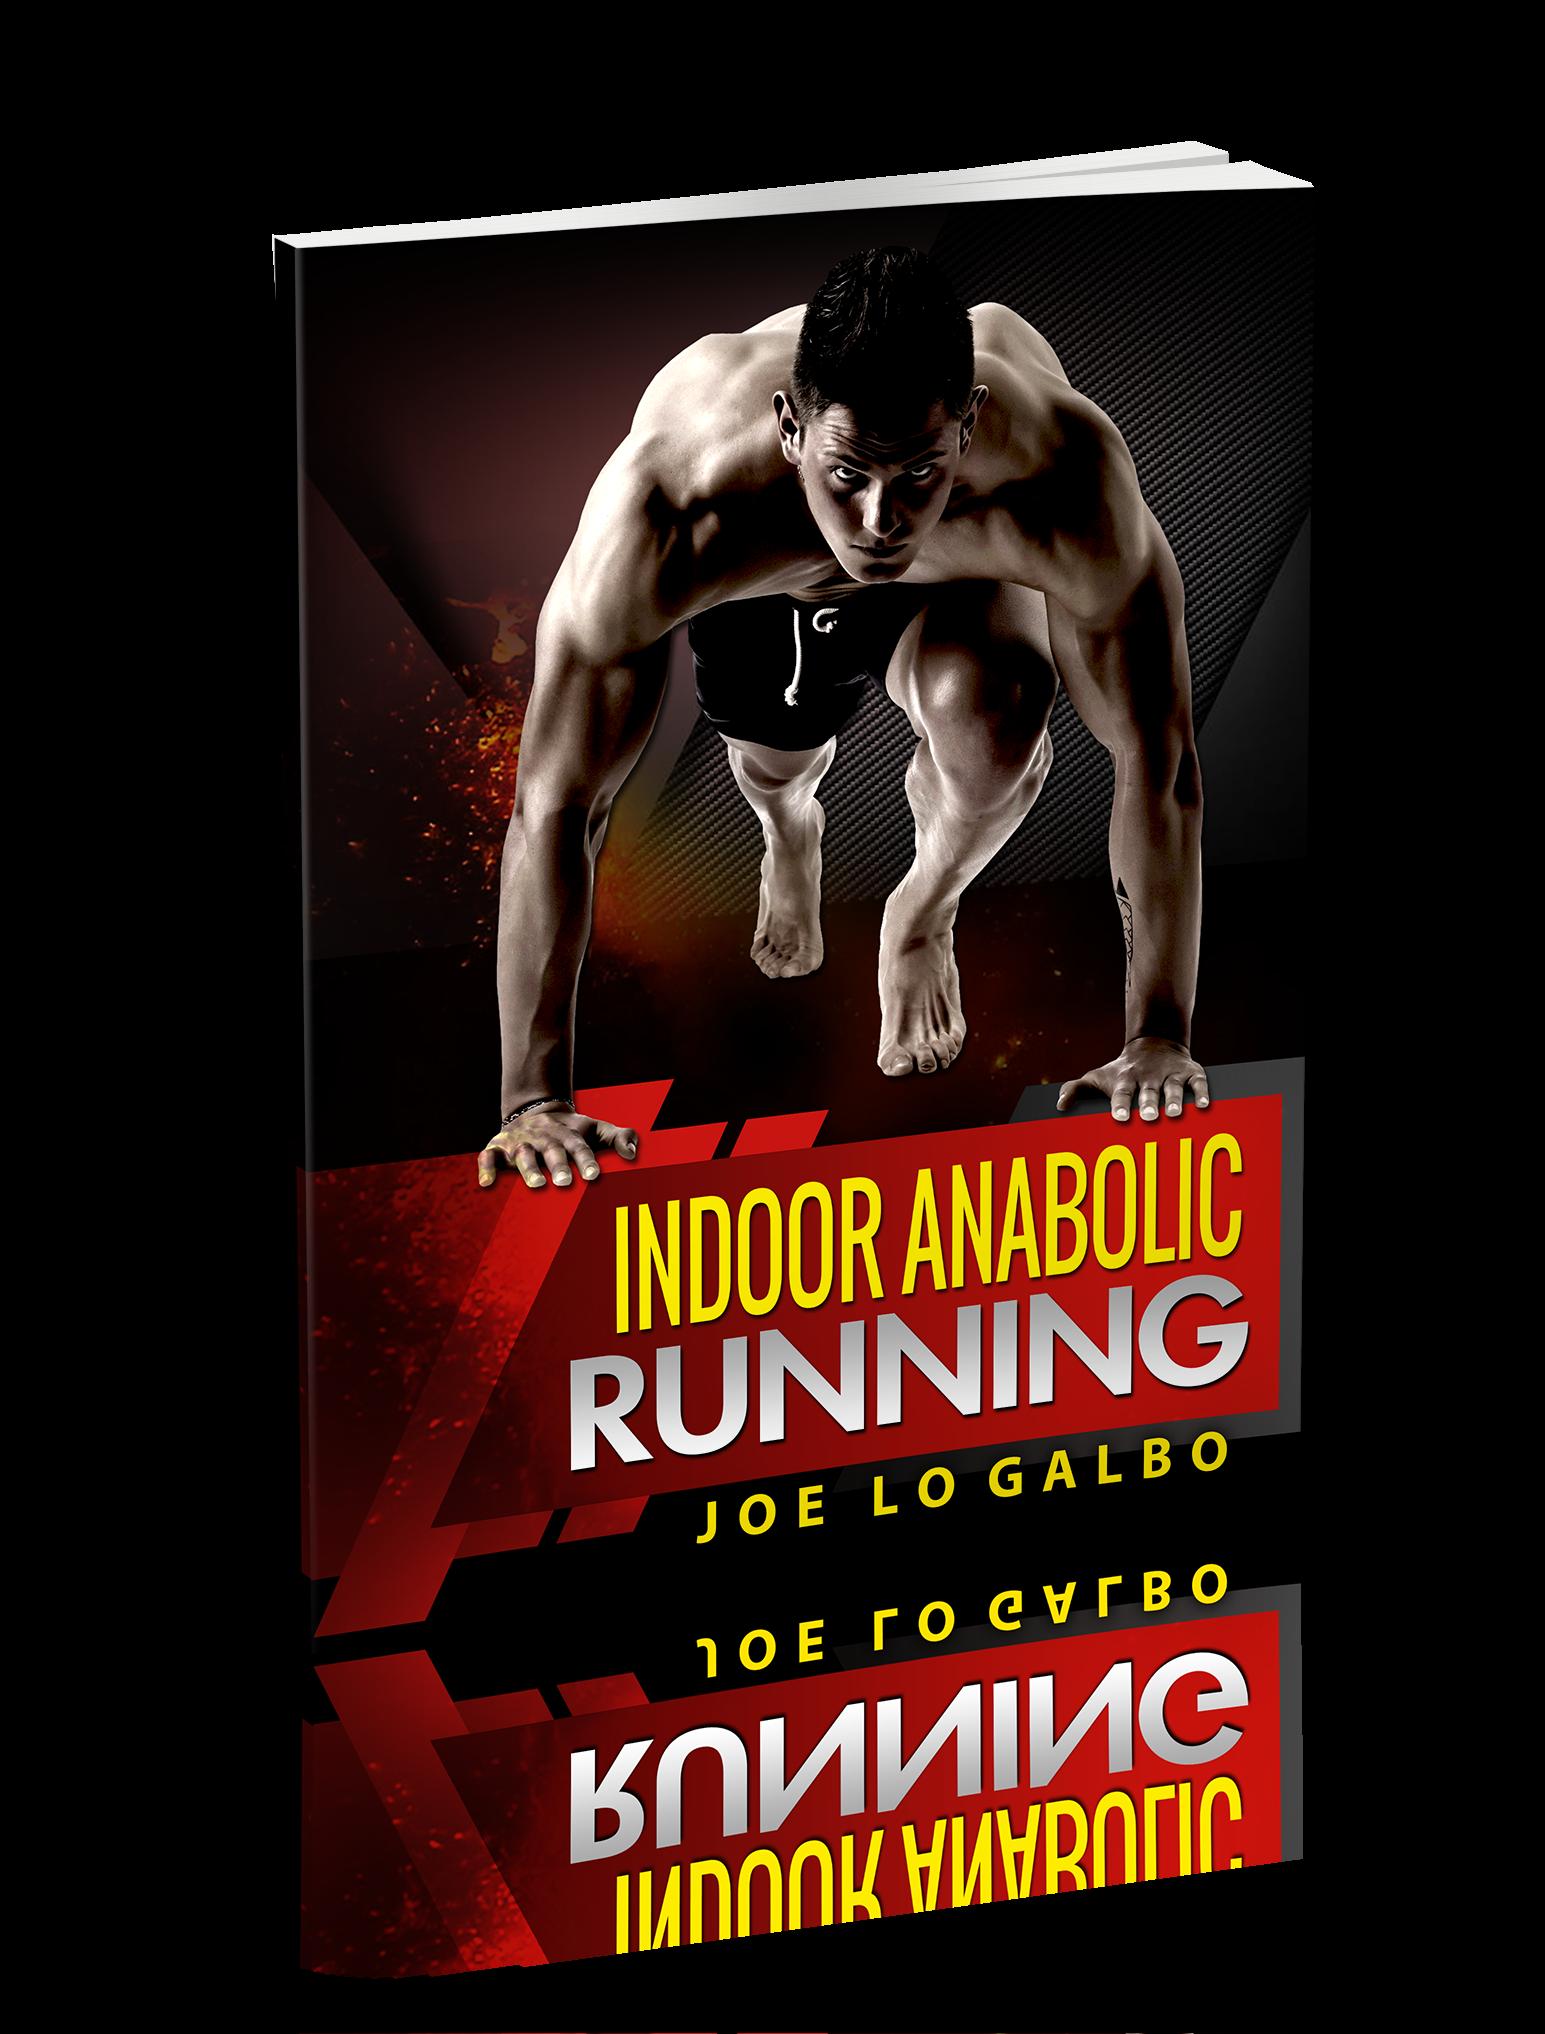 IndoorAnabolicRunning ebook - Anabolic Running